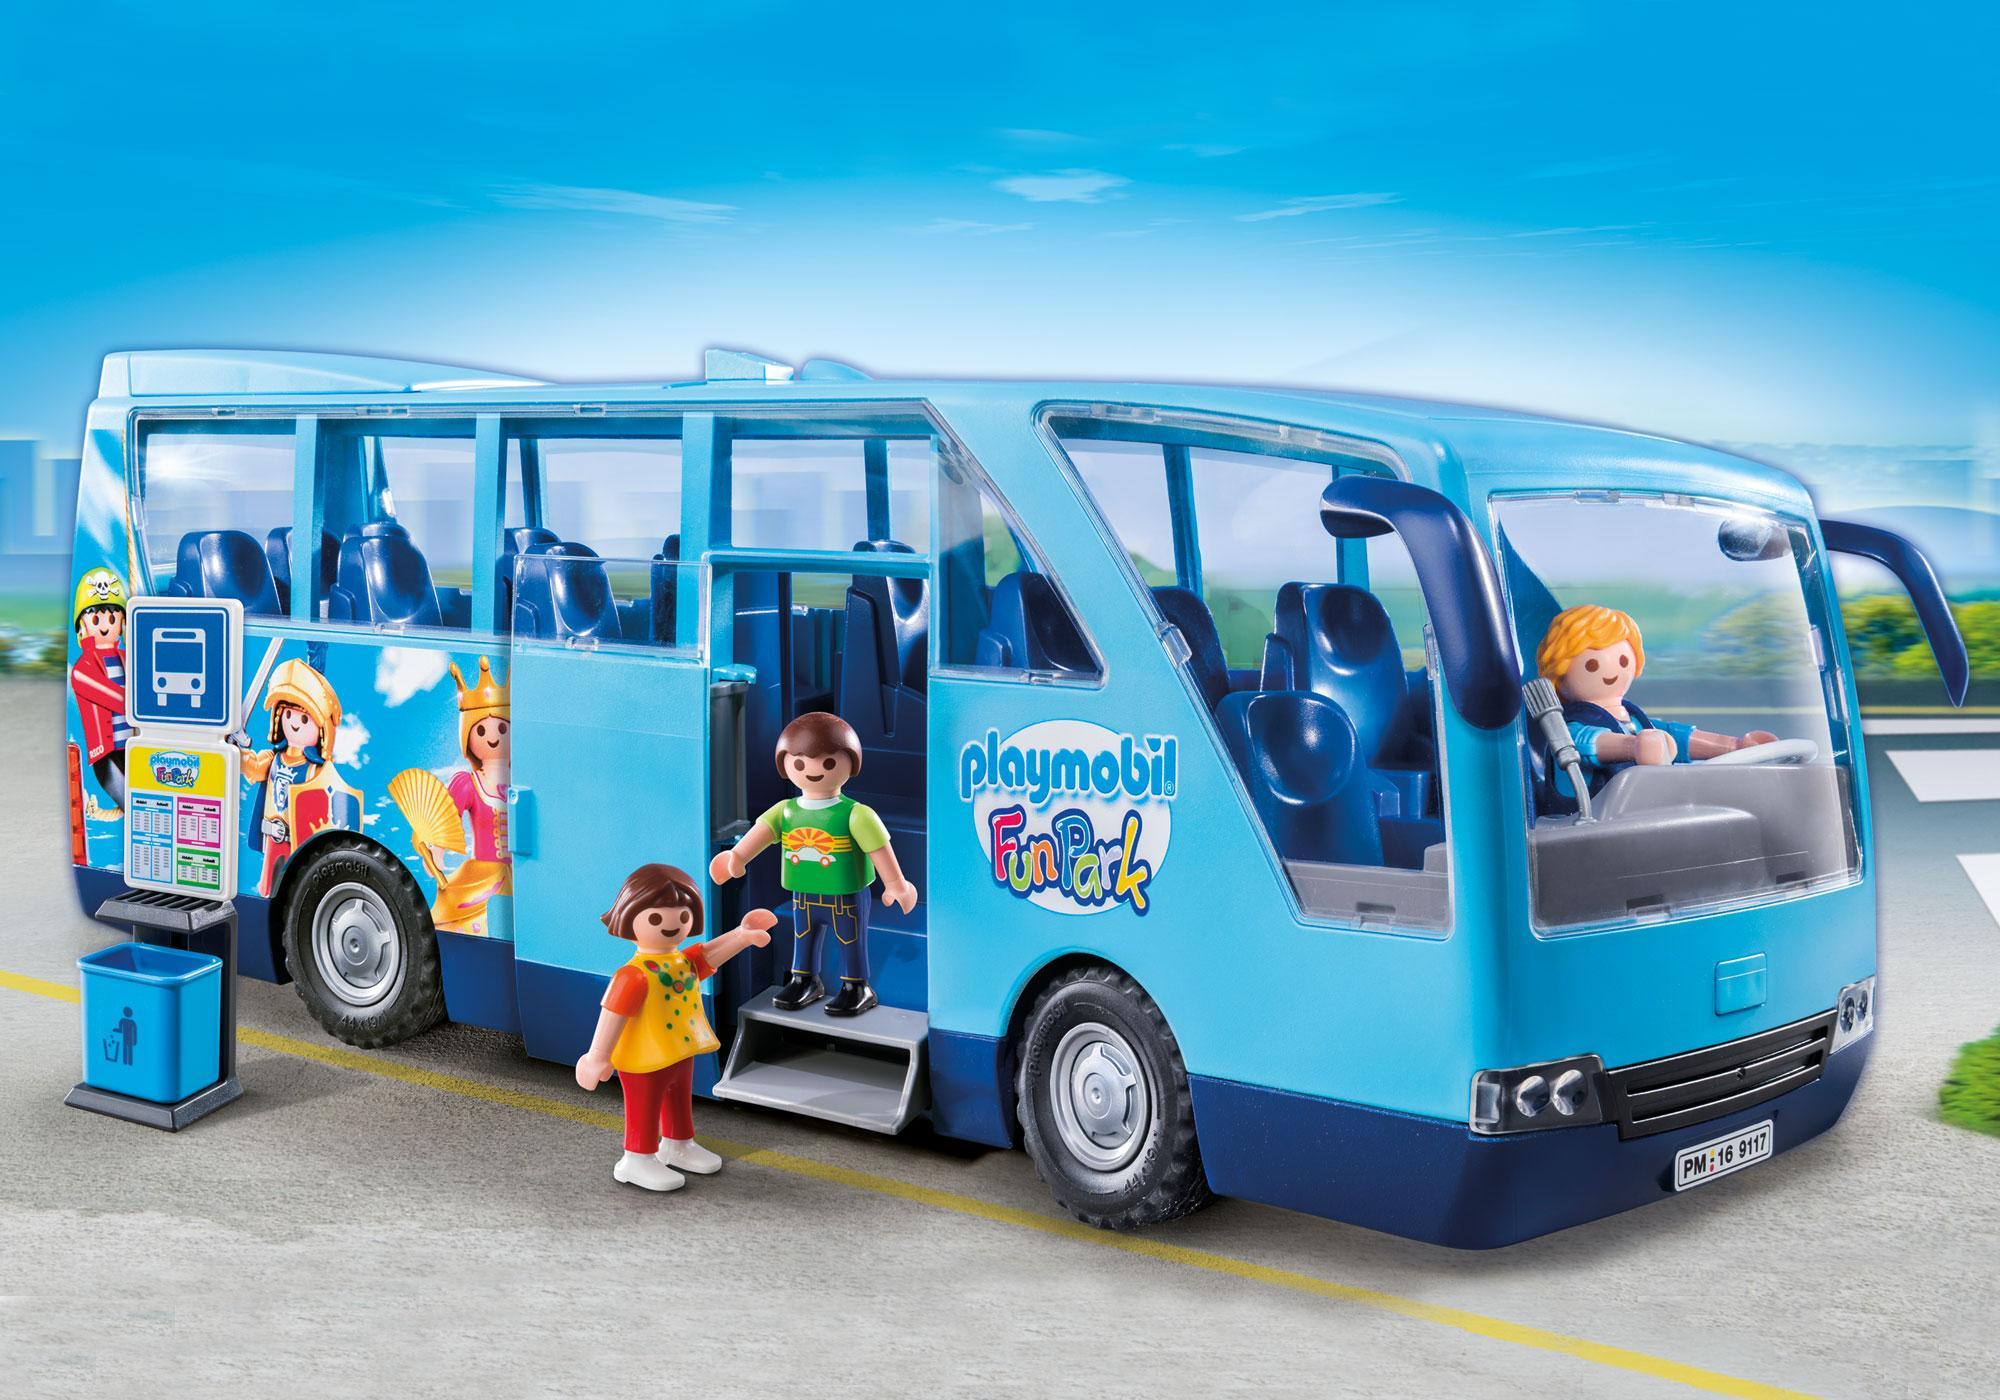 http://media.playmobil.com/i/playmobil/9117_product_detail/PLAYMOBIL-FunPark Bus navetta